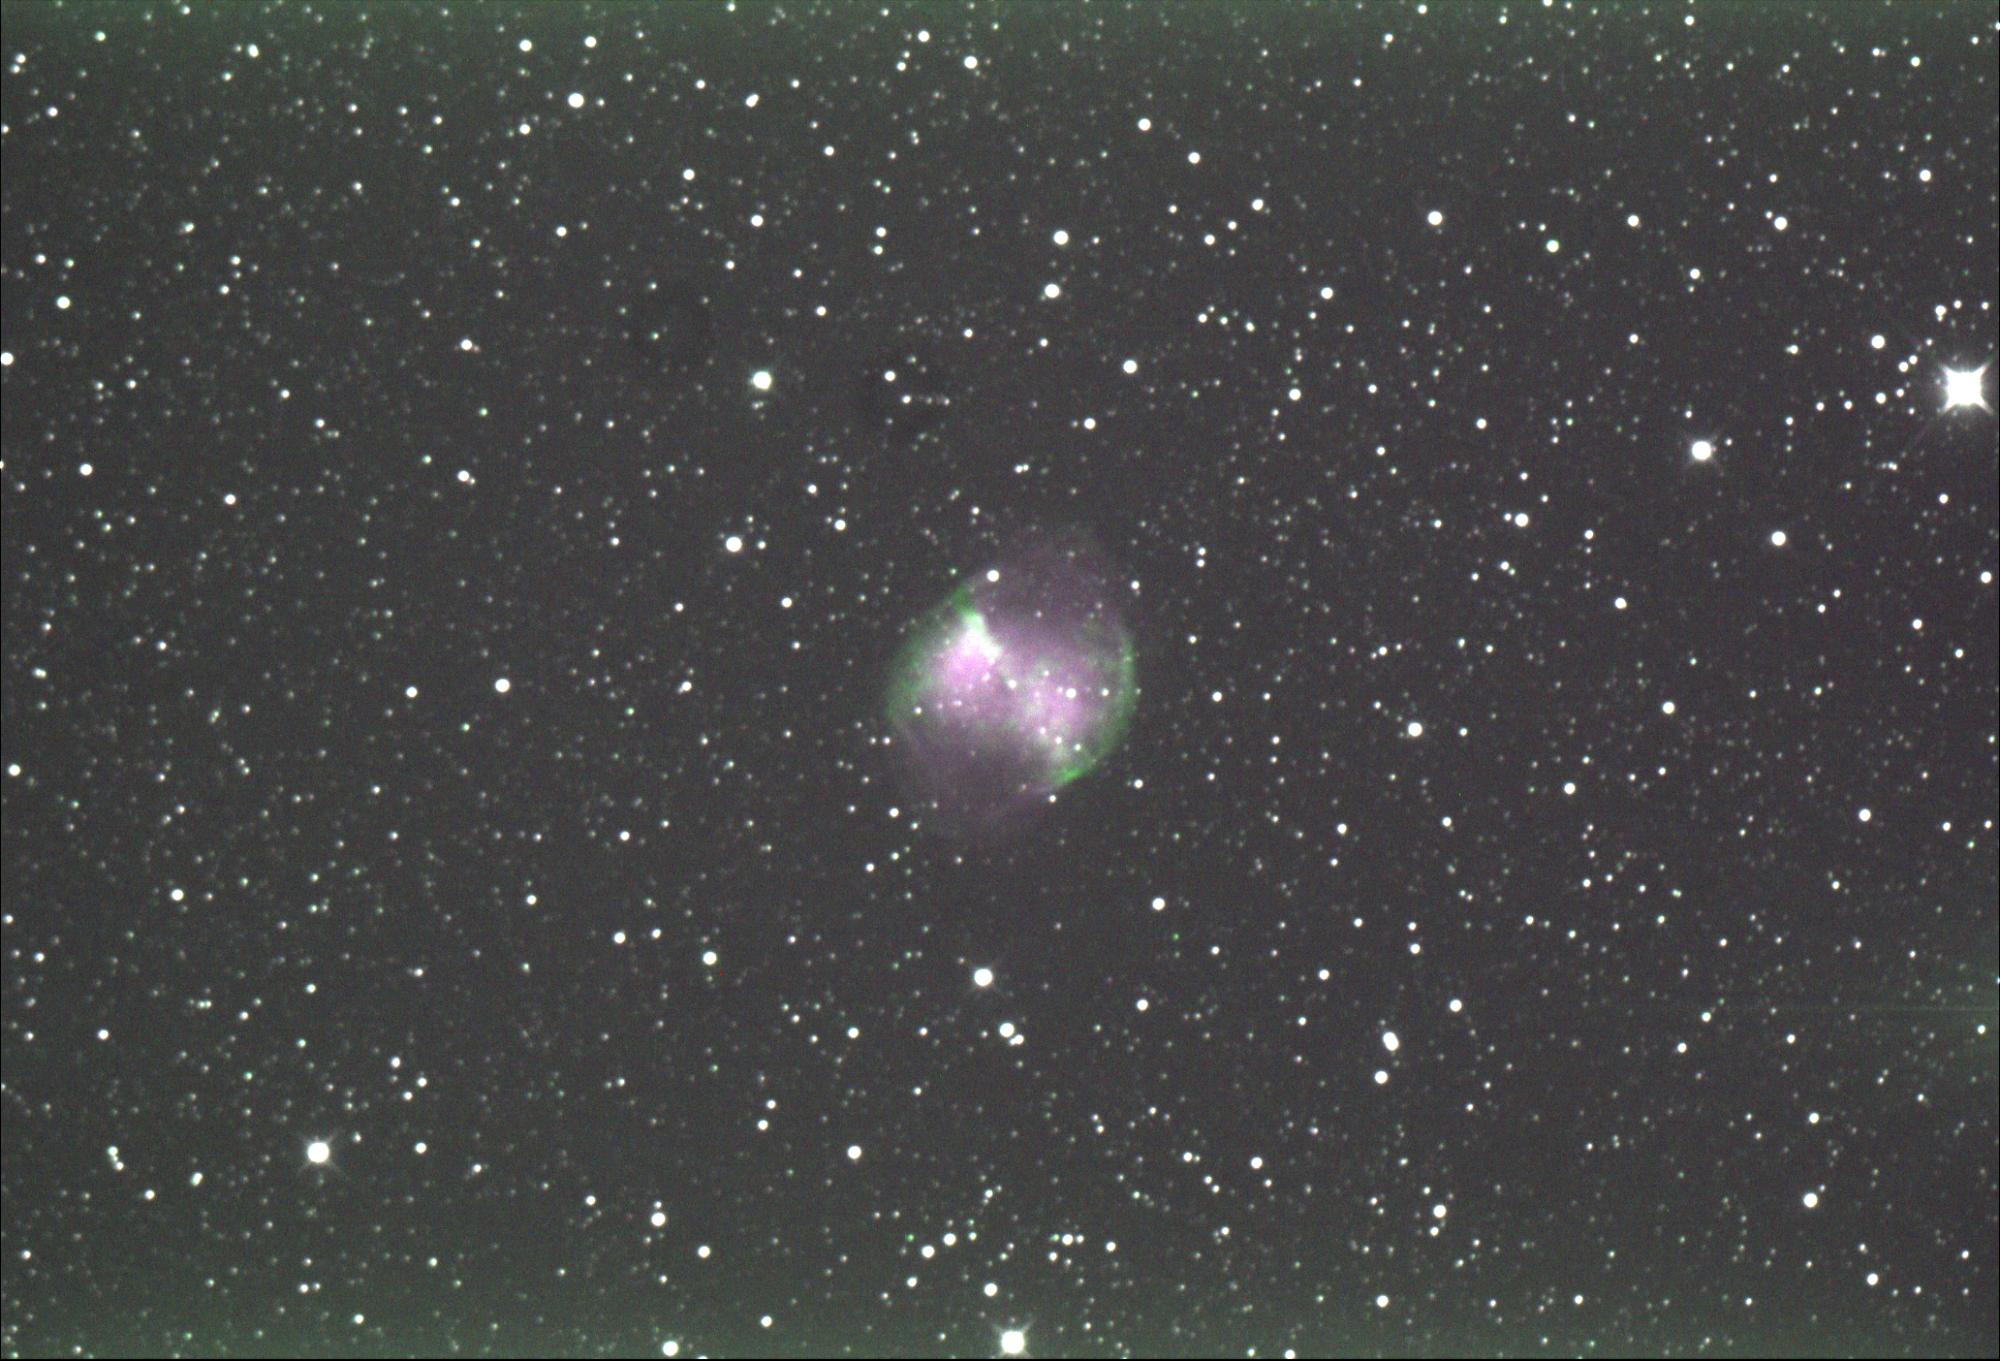 M27 du 28 altair add astroart 30 x 20 s.png